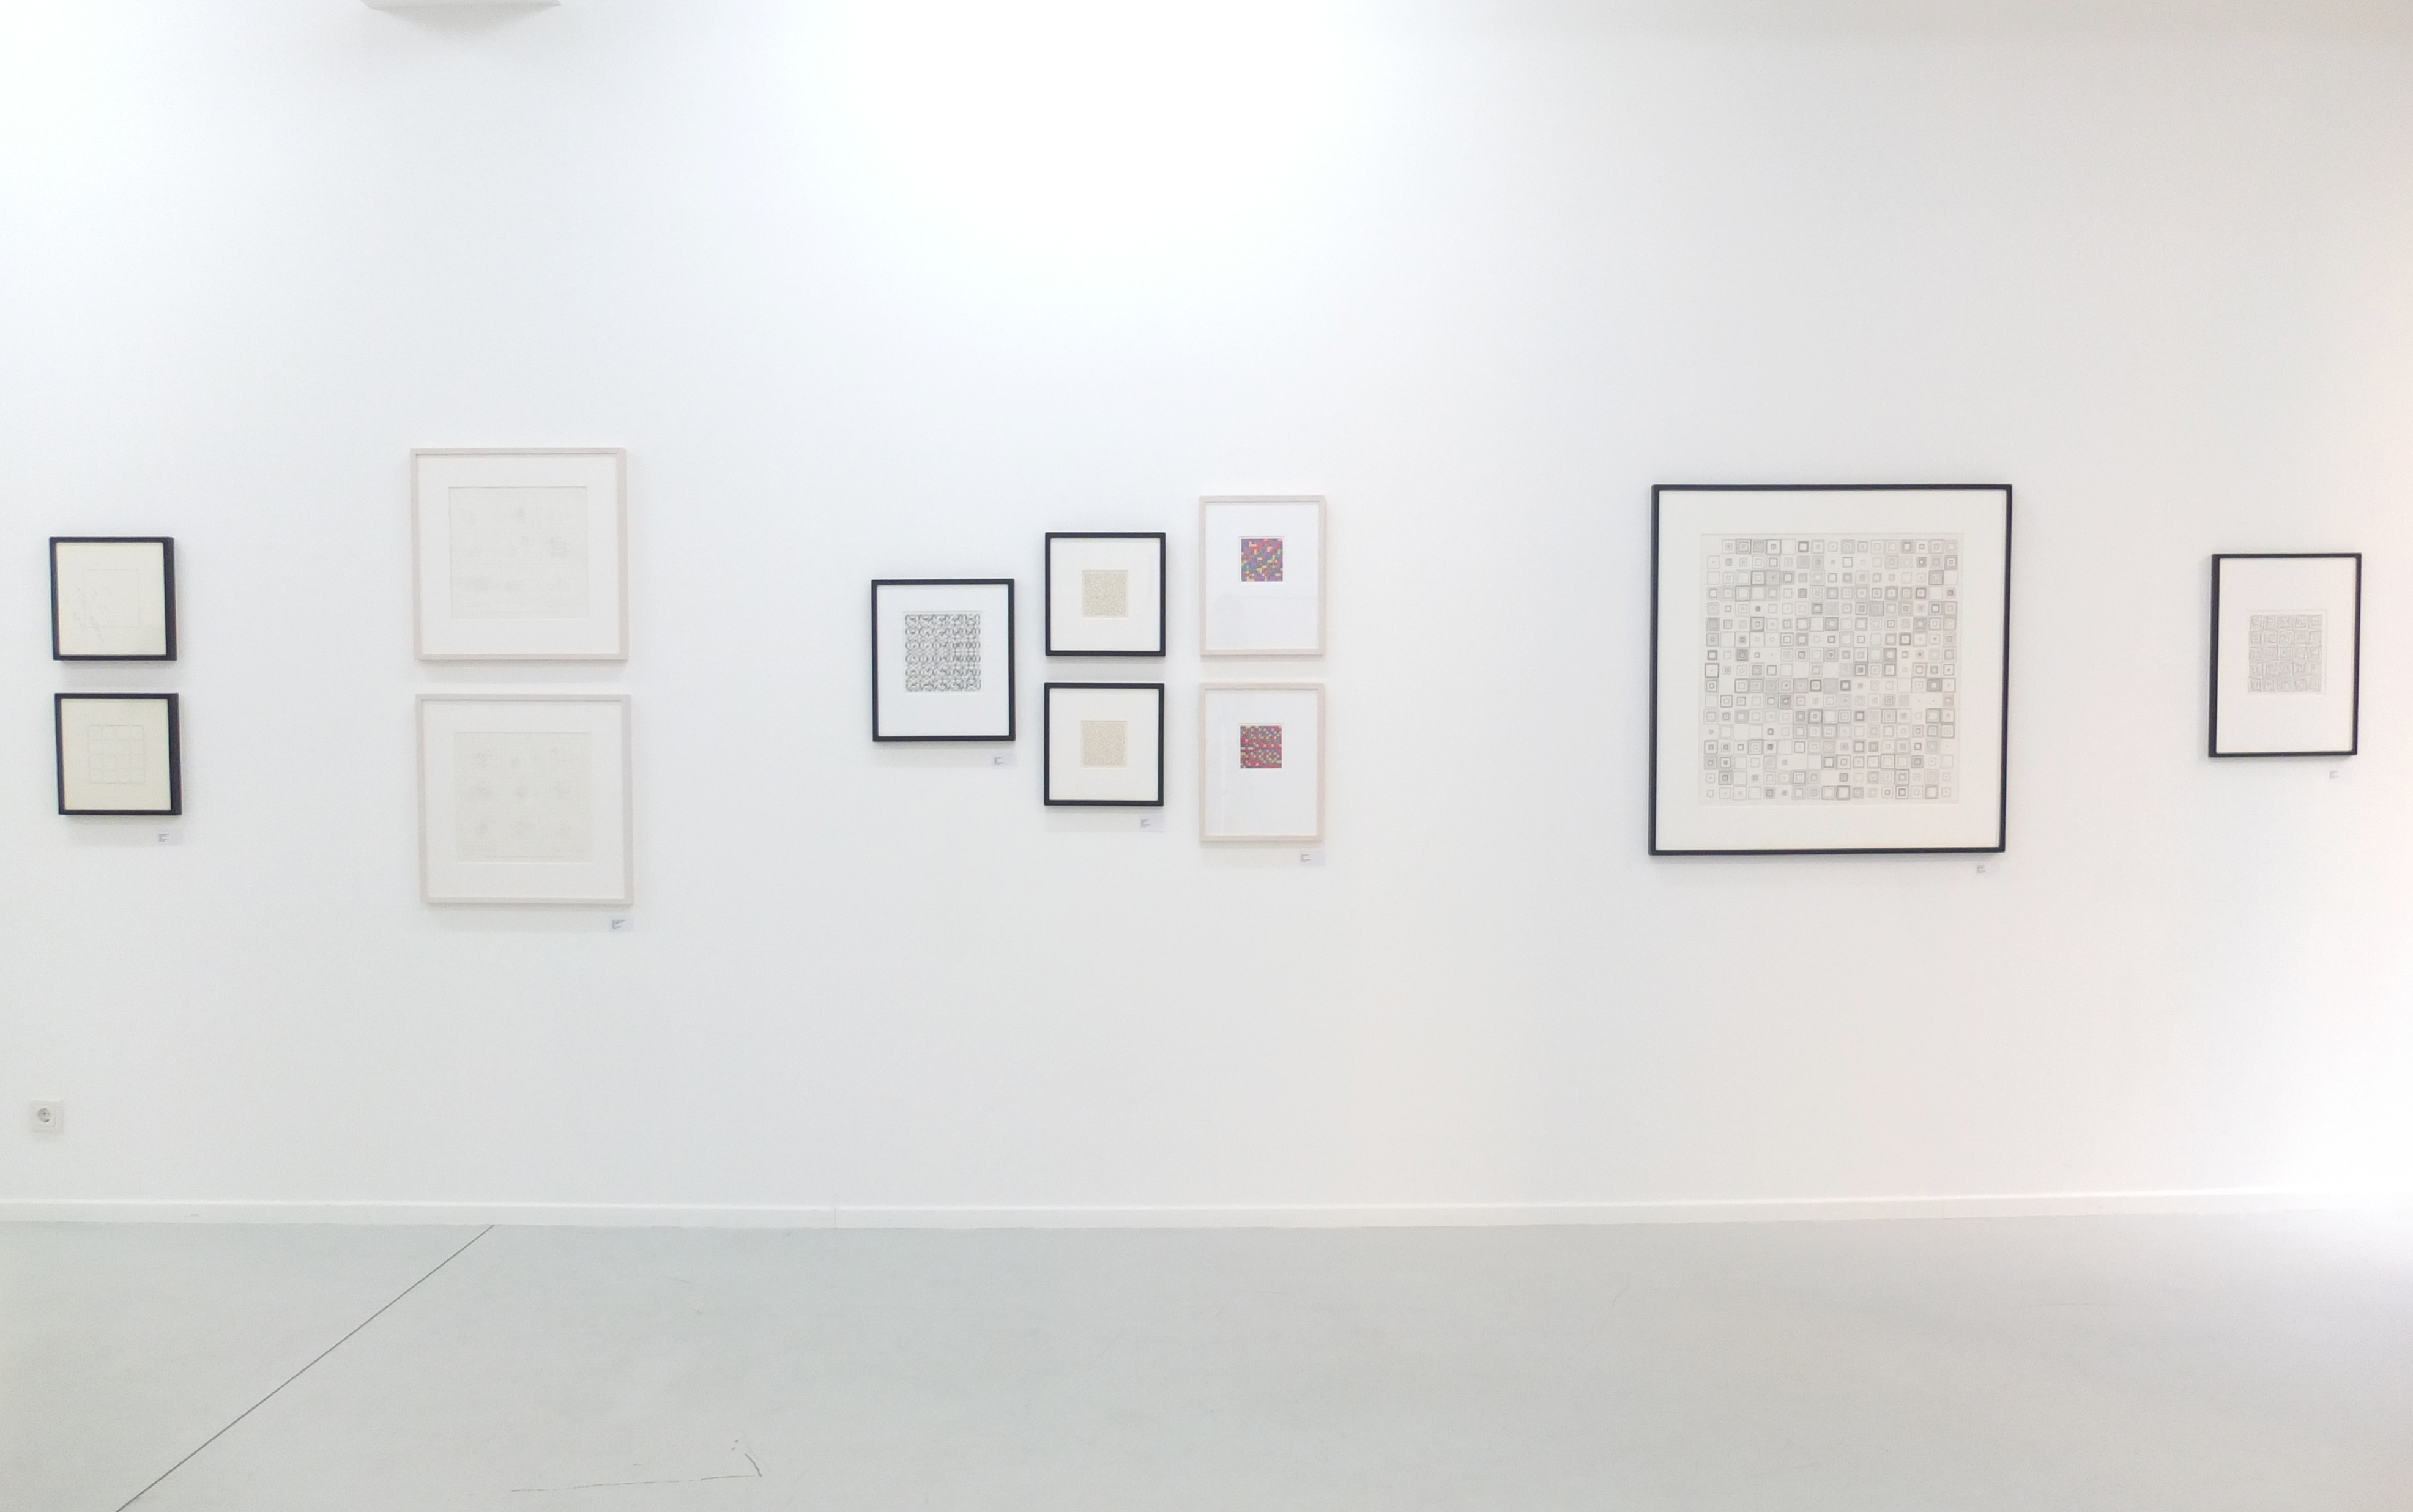 Aesthetica, Ausstellungsansicht, 2015